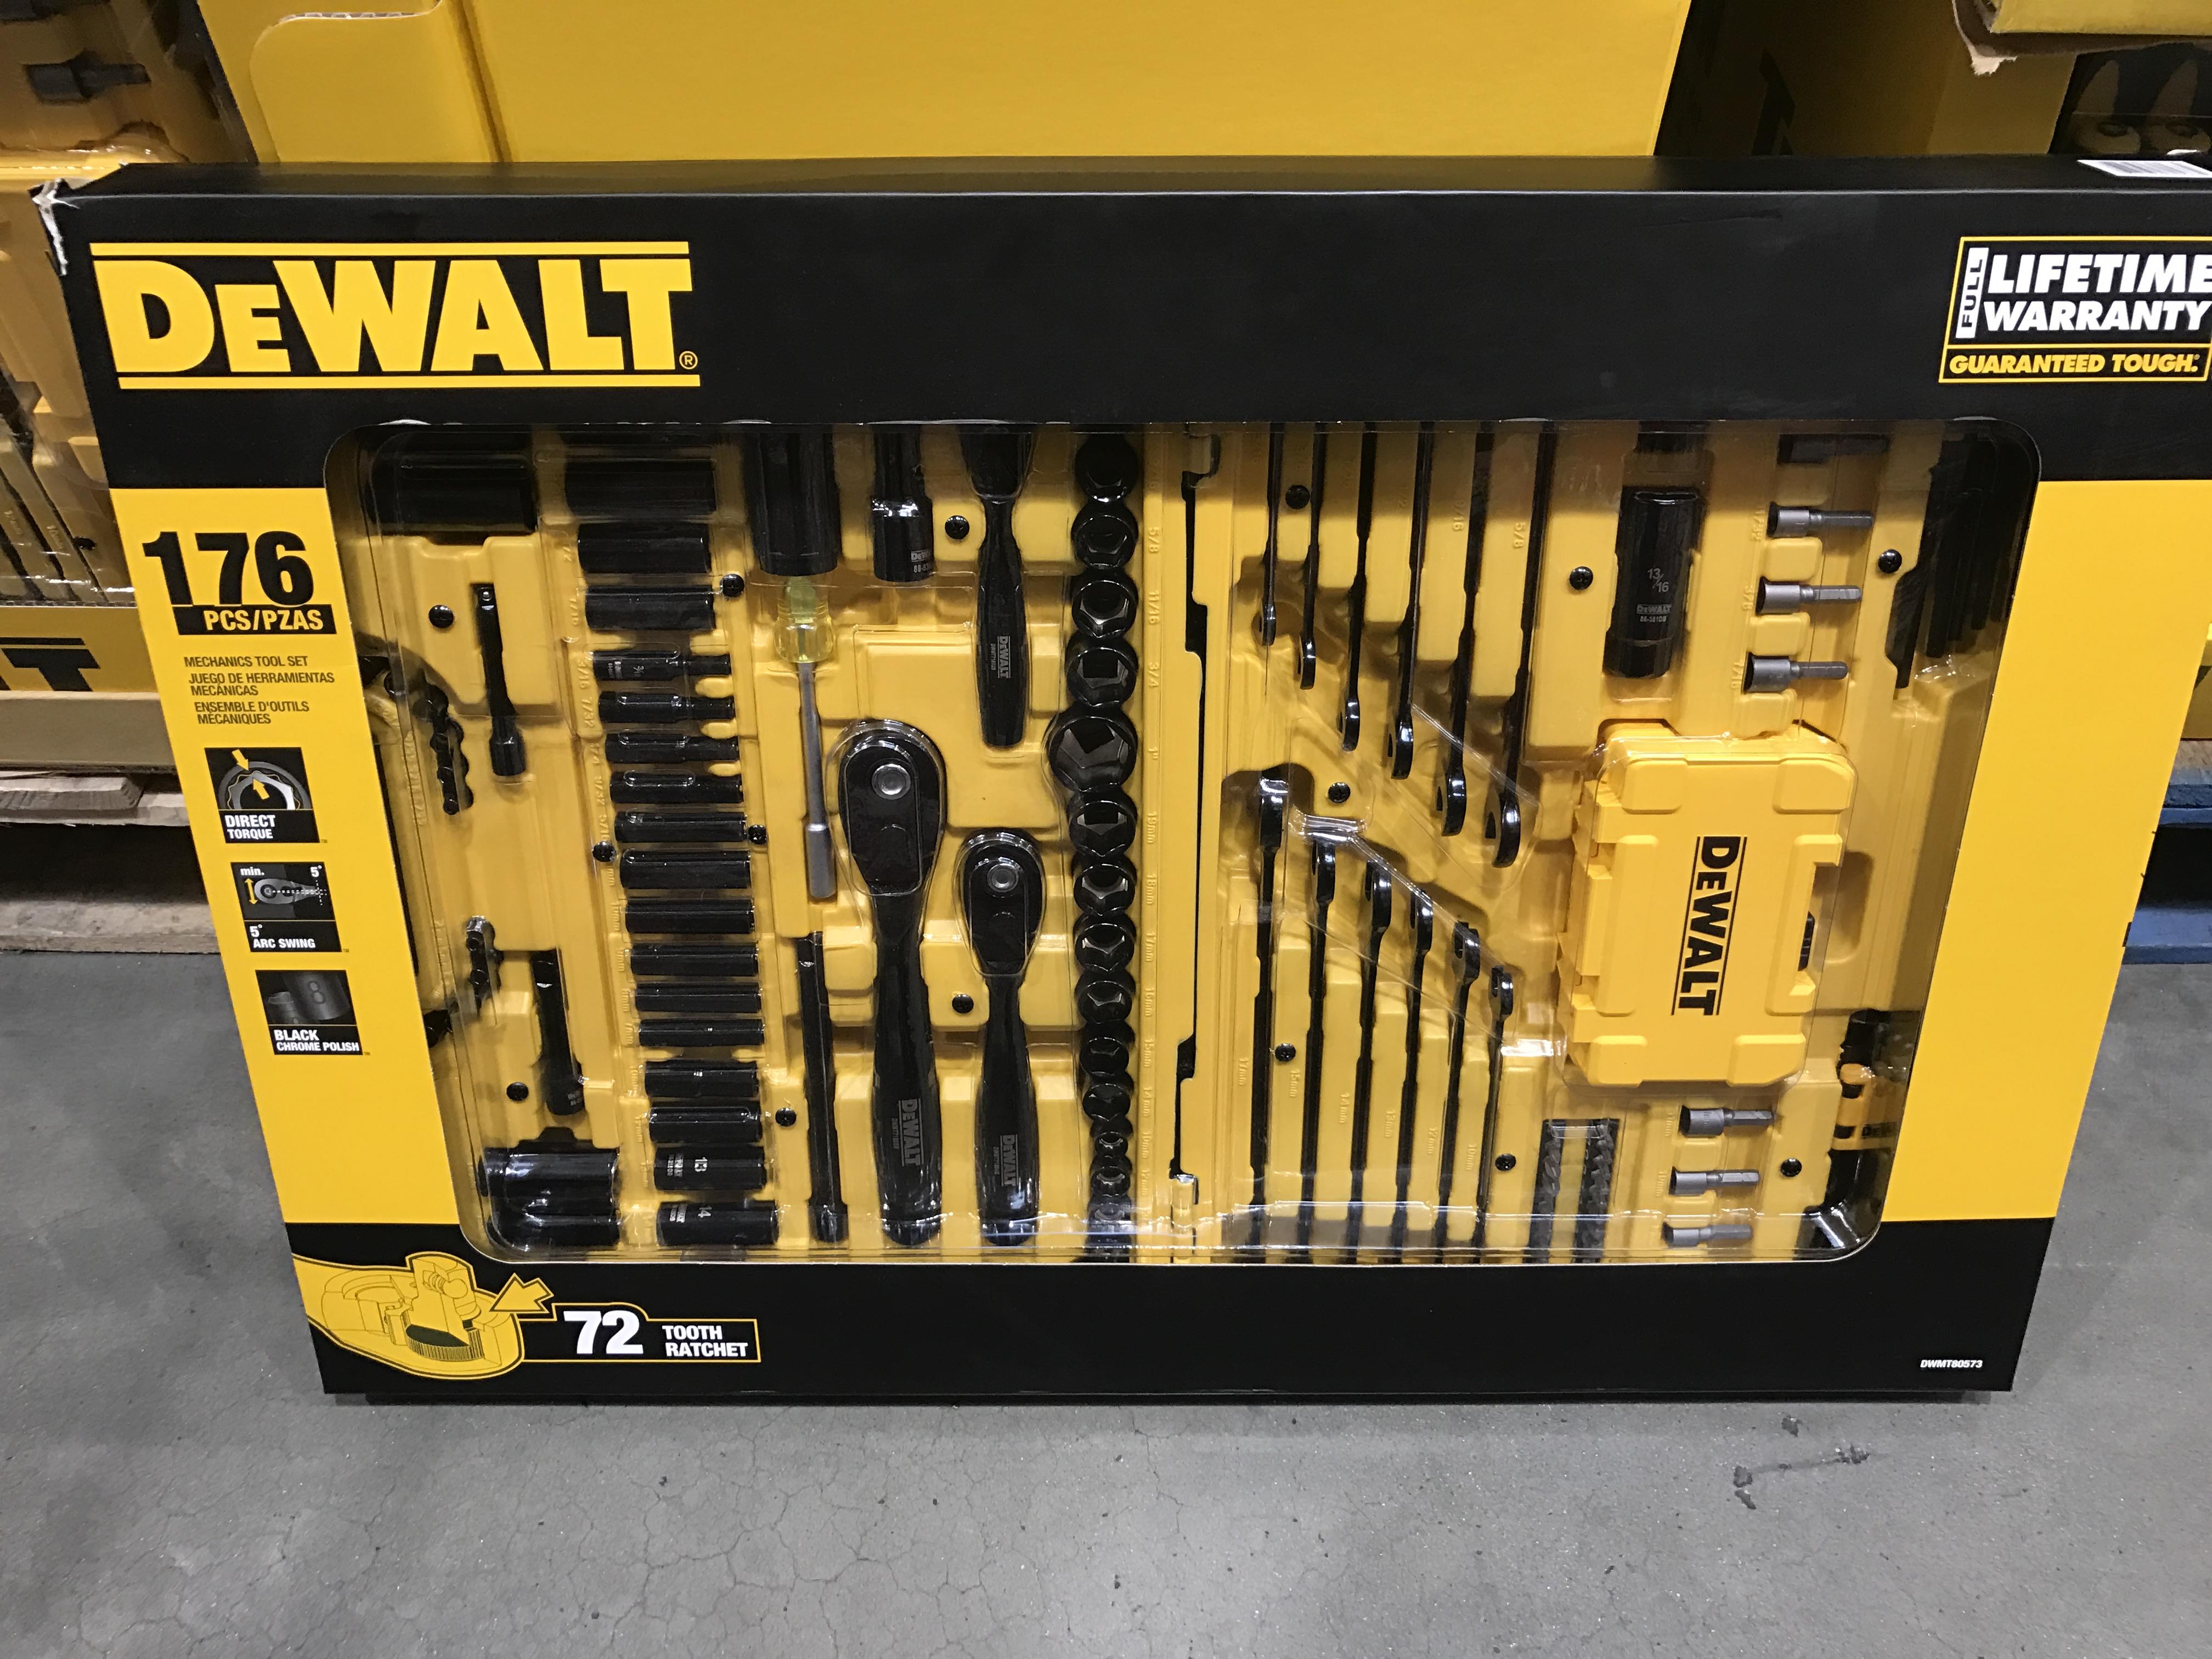 dewalt hand tool set. dewalt hand tool set l